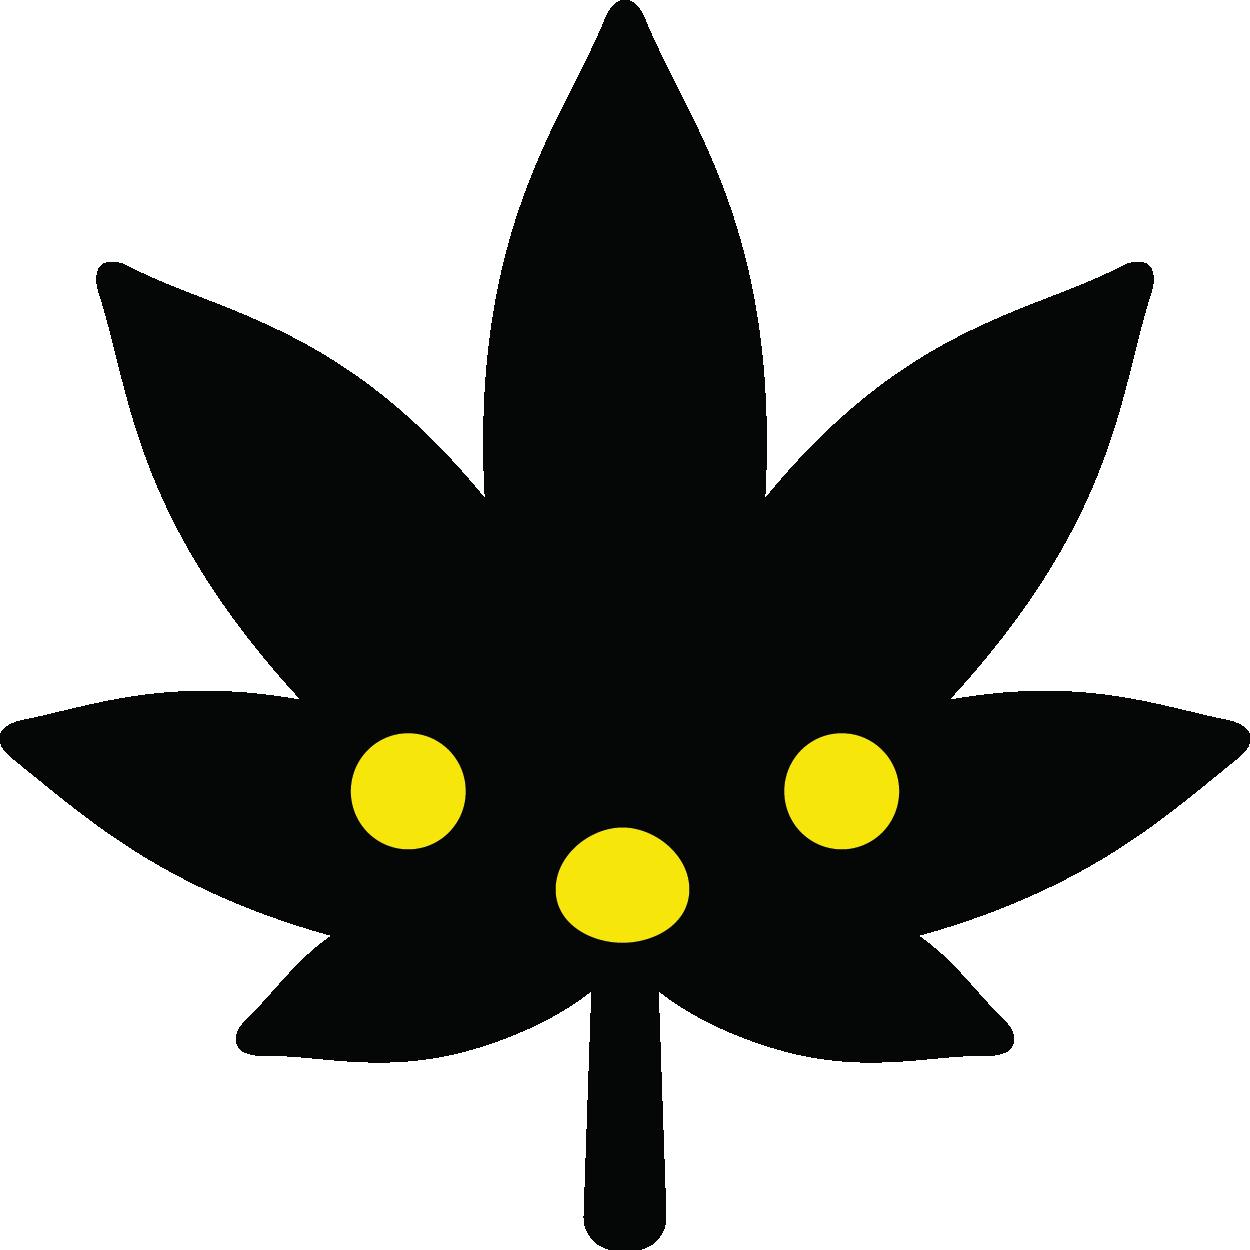 Potmoji Black Edition messages sticker-1